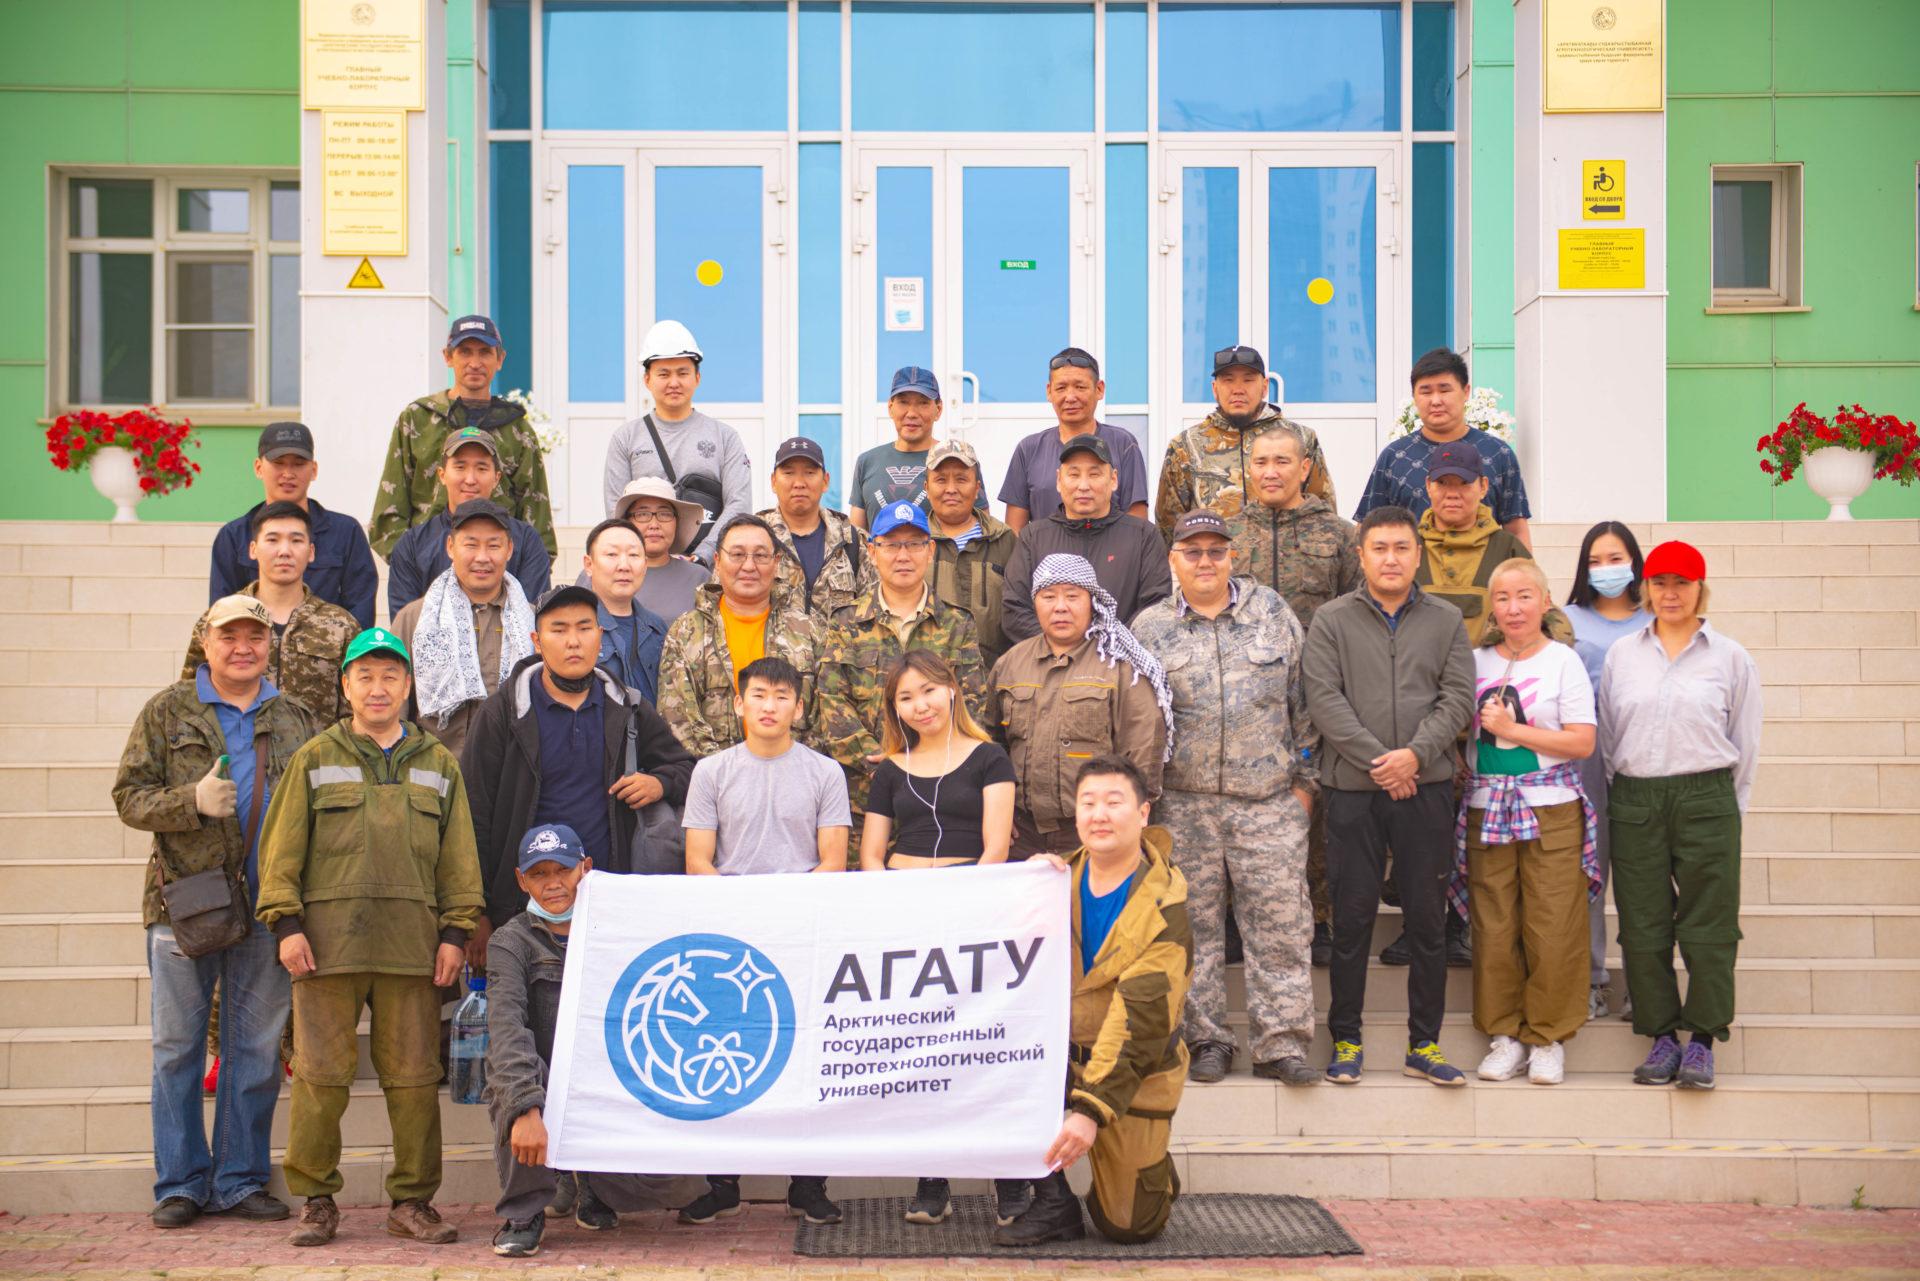 Добровольцы-огнеборцы АГАТУ: наша помощь необходима!